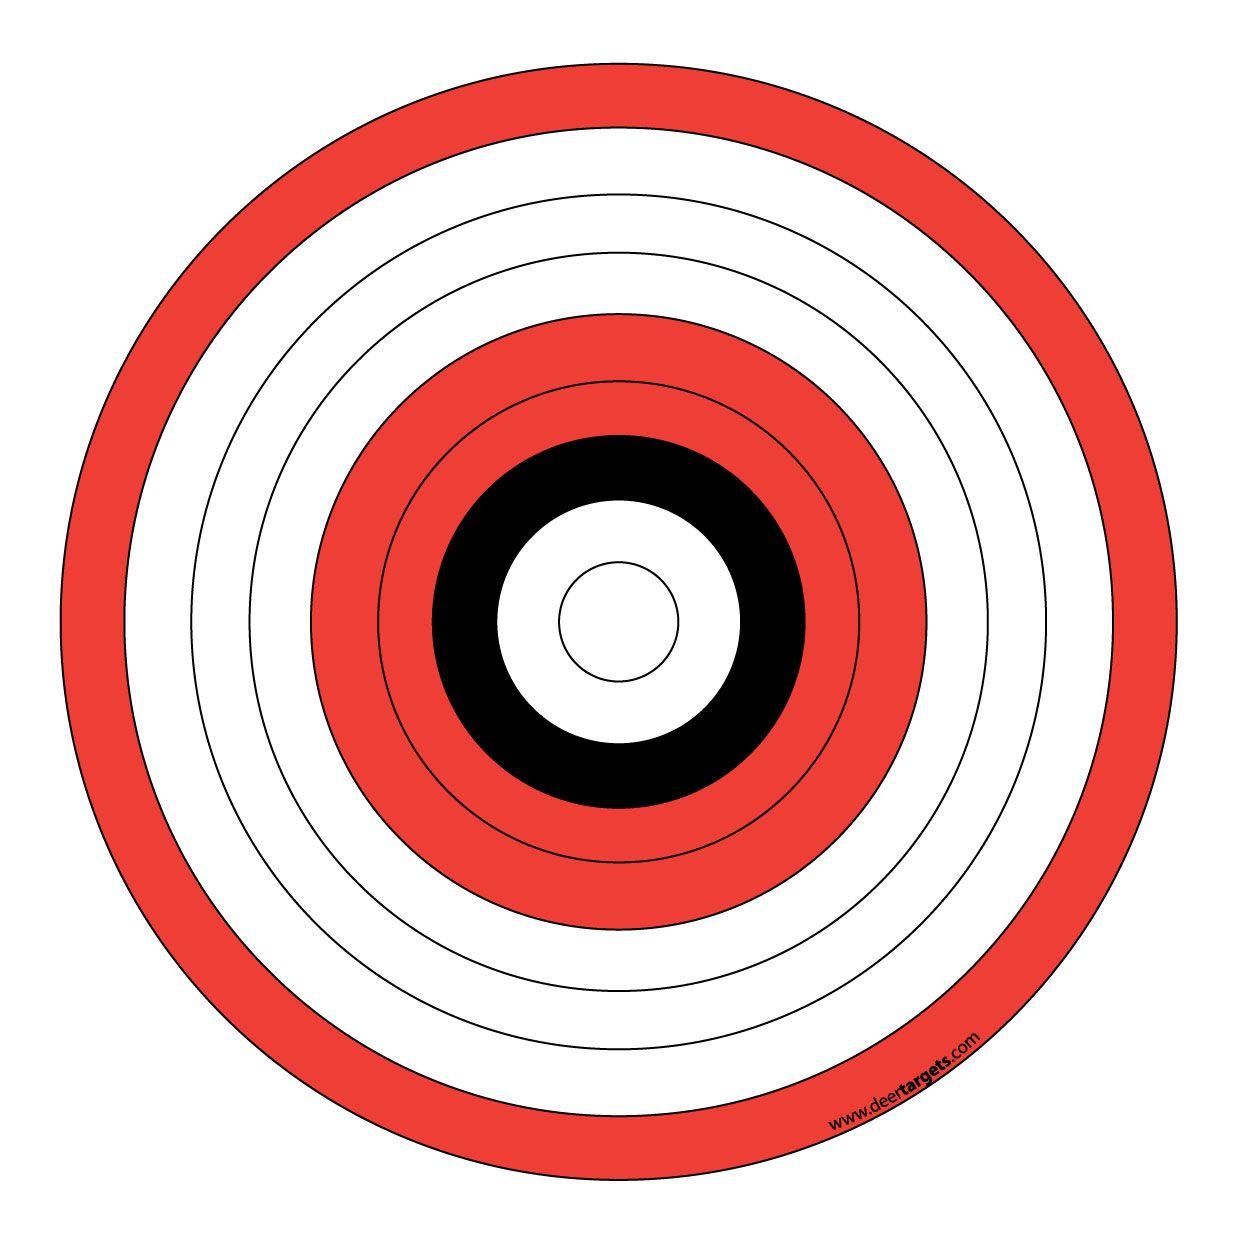 Printable Archery Targets Archery